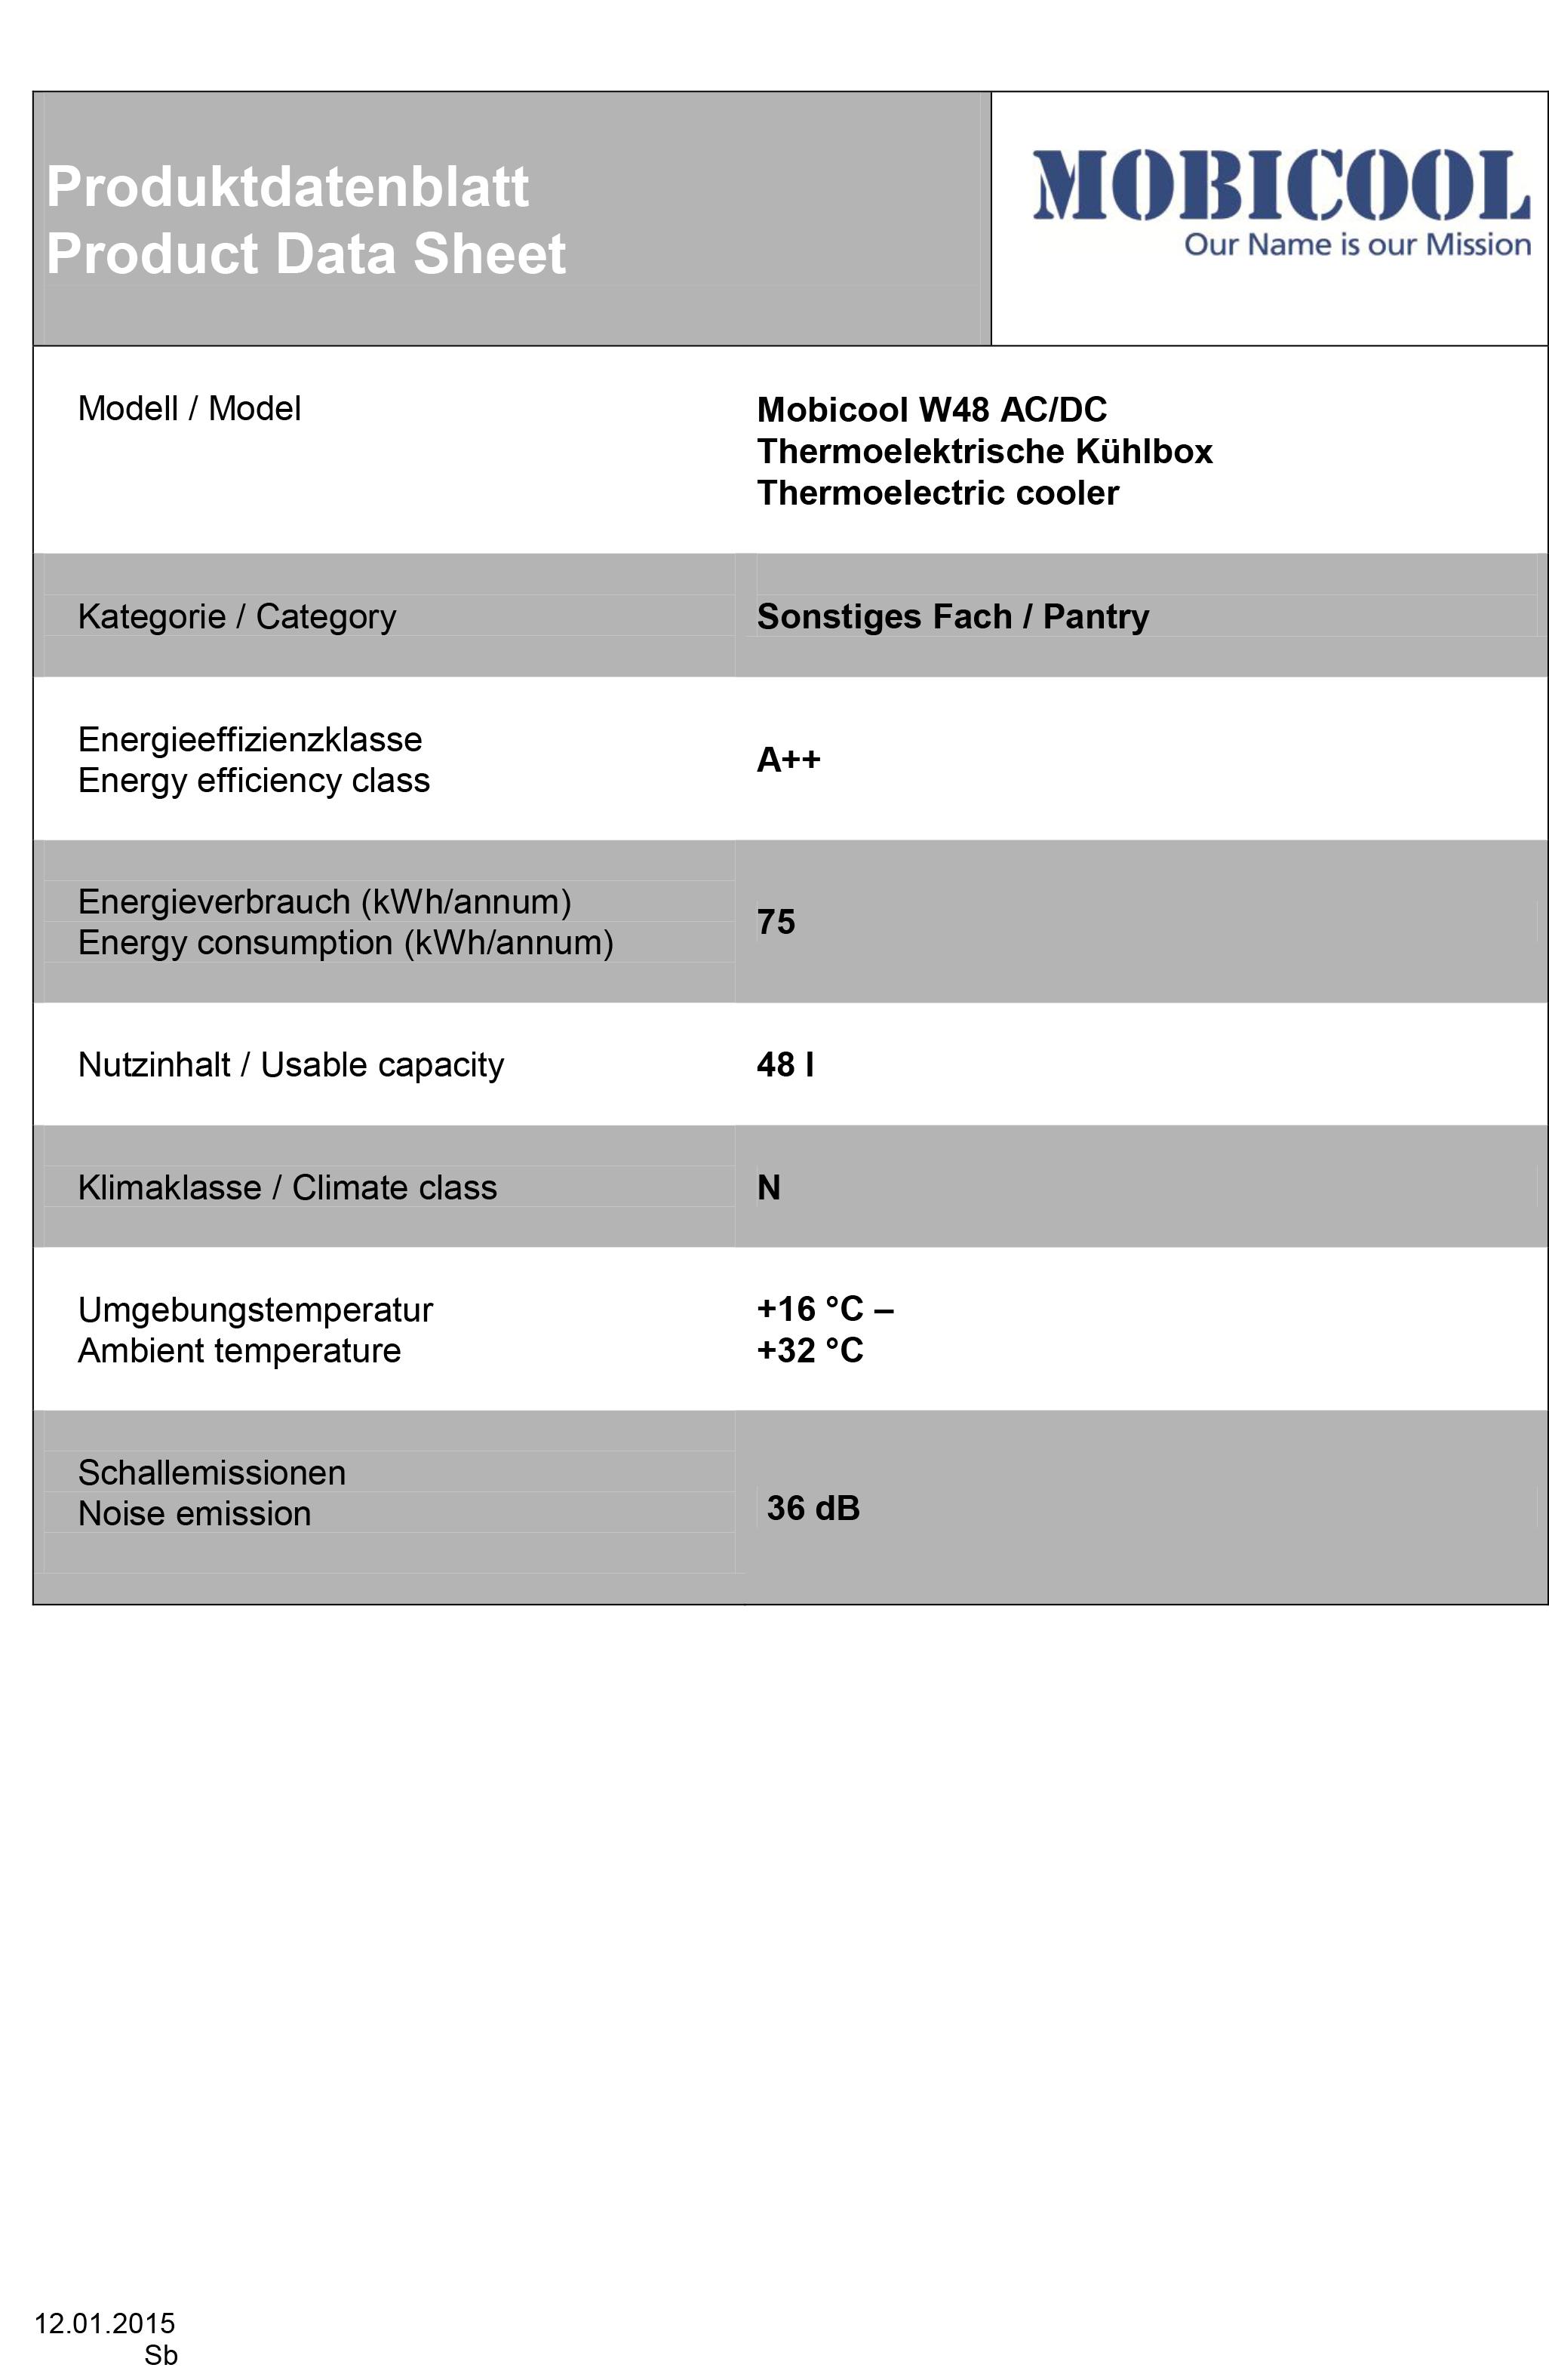 Datenblatt.jpg